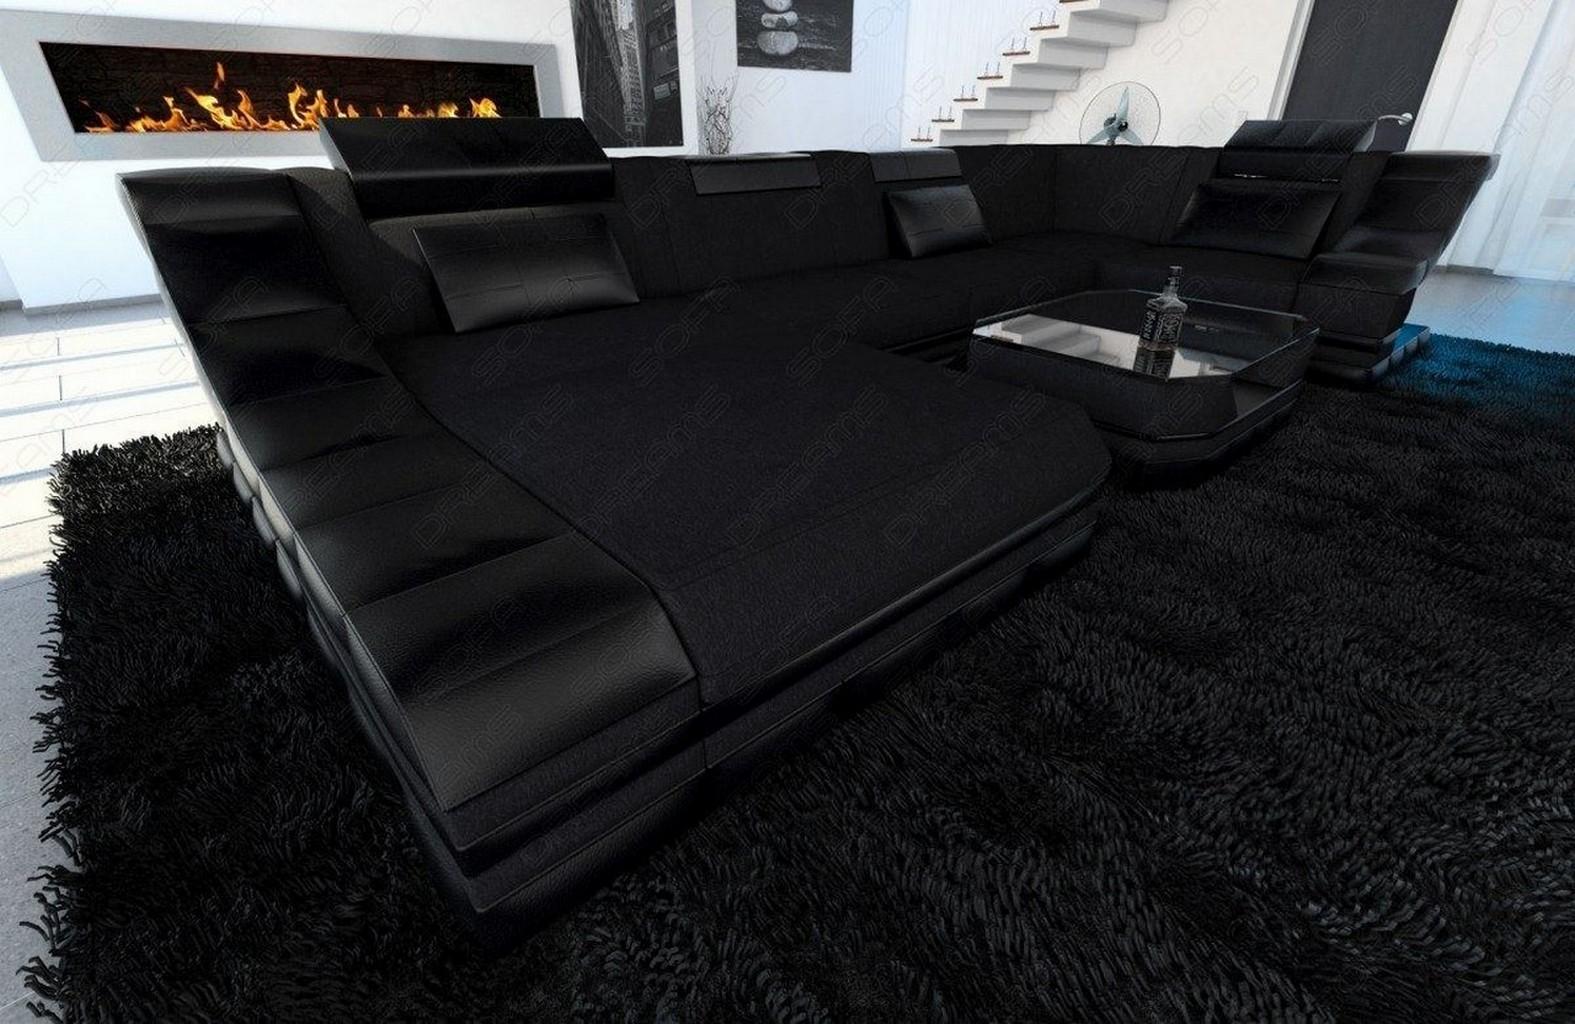 haut pigmentflecken creme italienisch. Black Bedroom Furniture Sets. Home Design Ideas